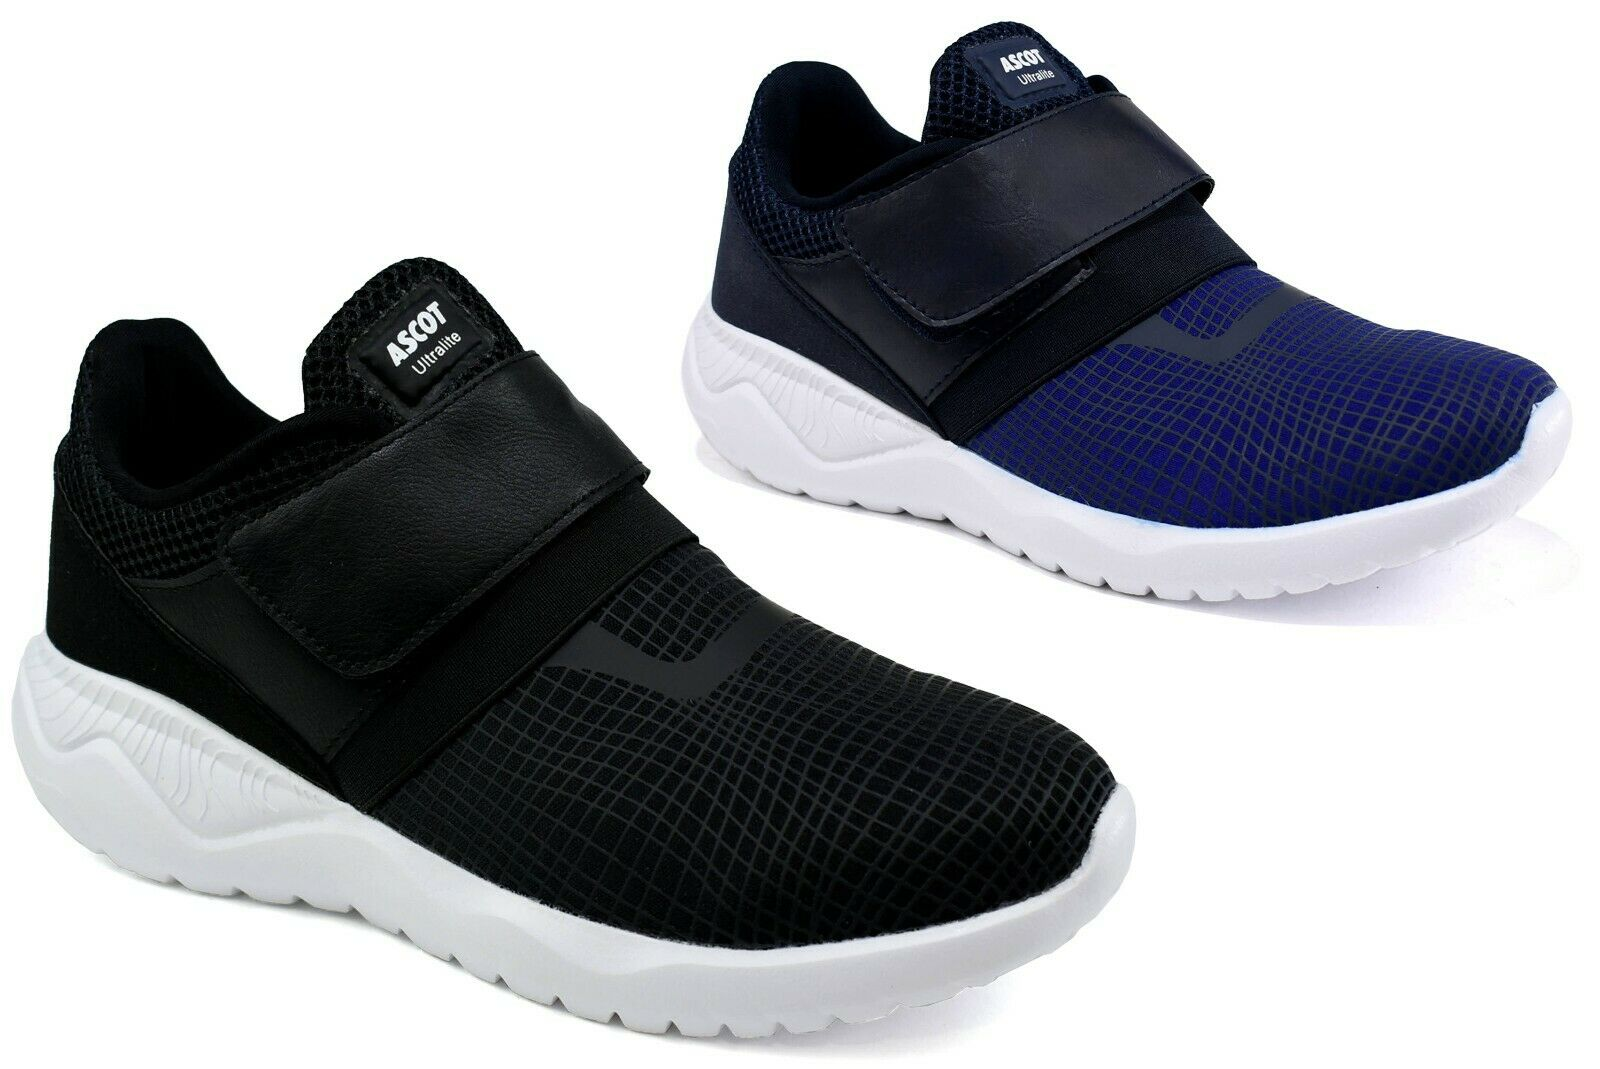 Mens New Easy Fasten Casual Walking Running Gym Fitness Memory Foam Trainer Shoe